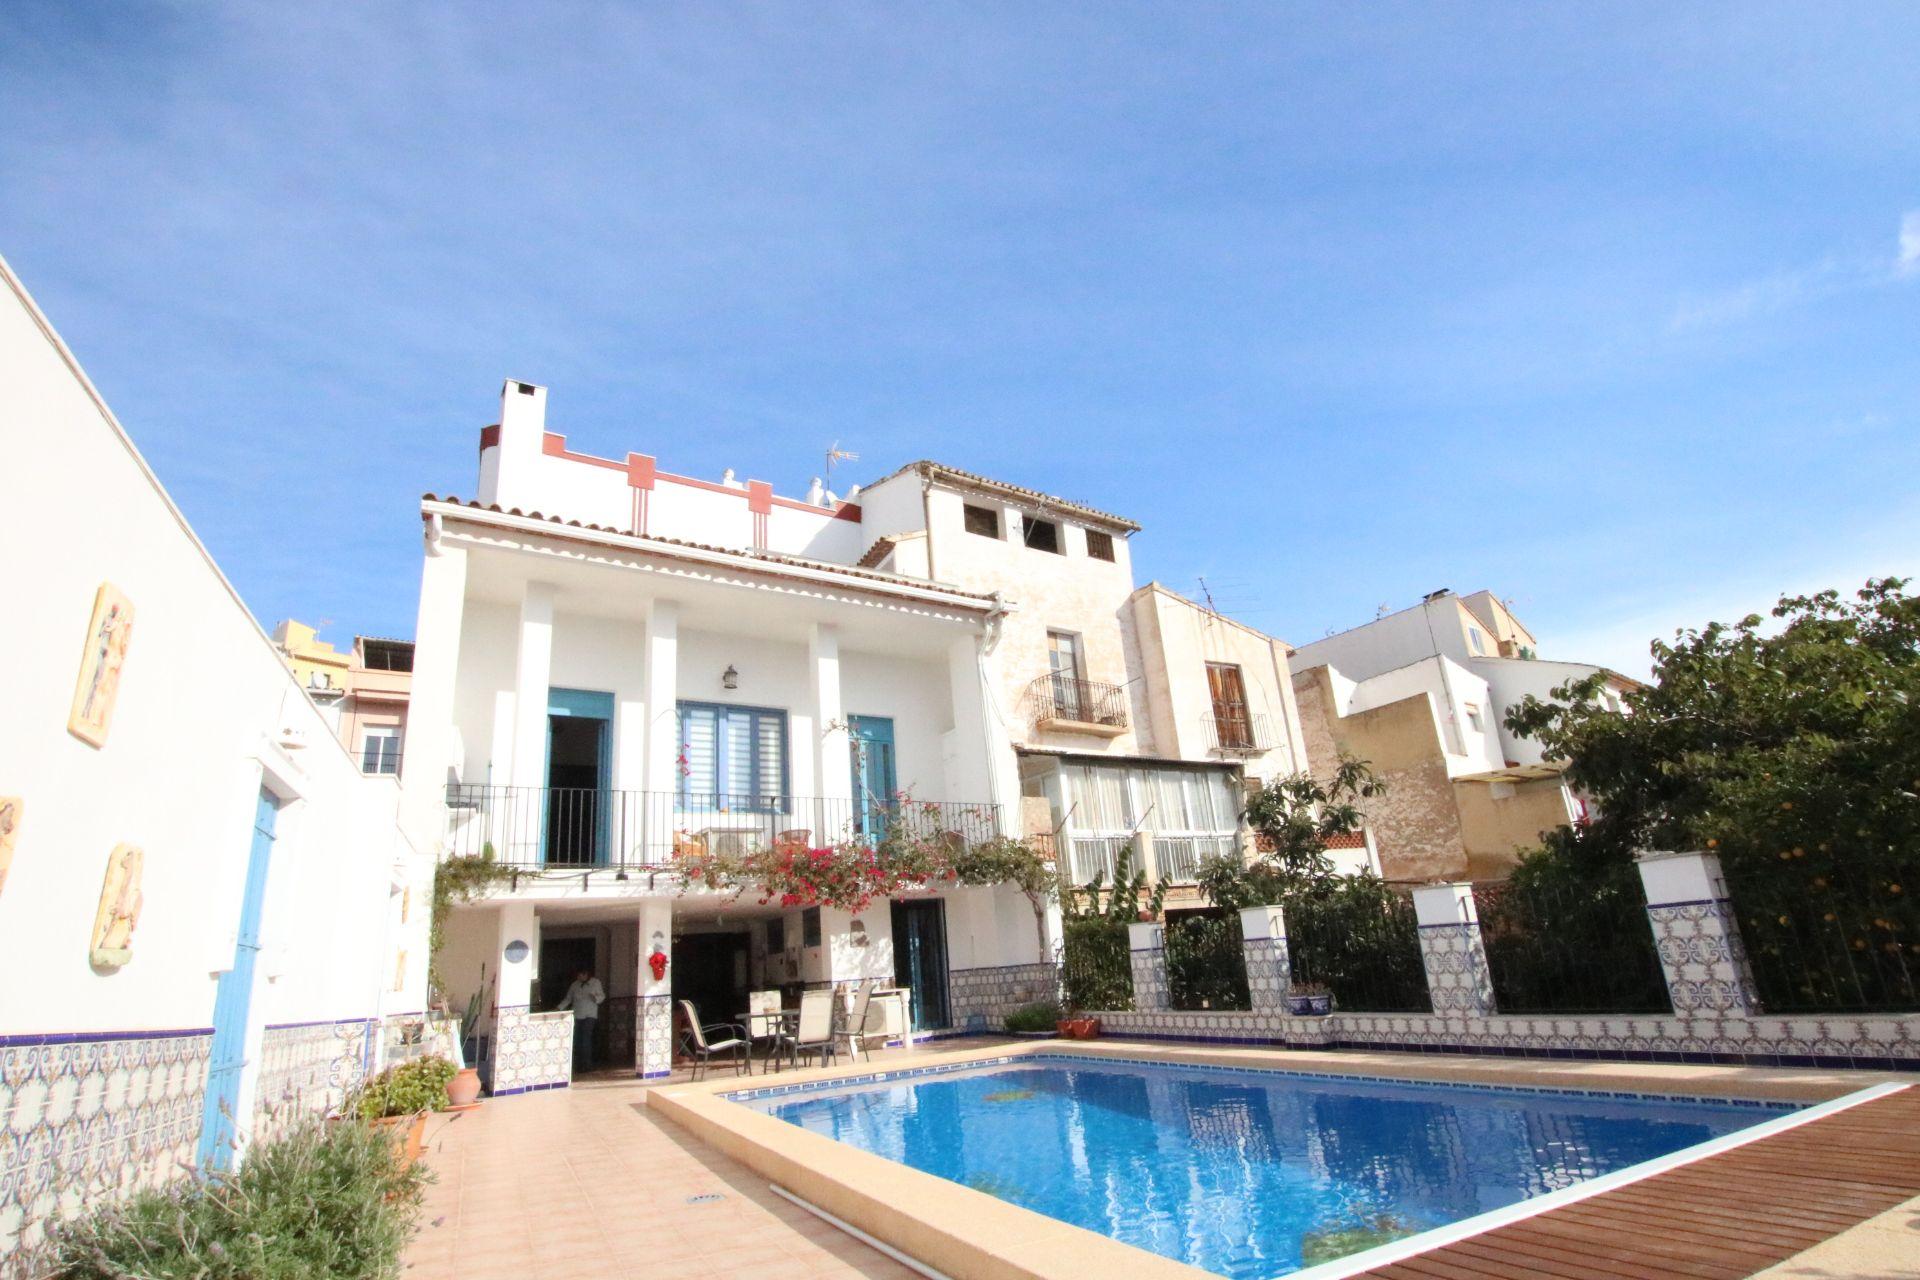 Villa de Lujo en Callosa d'En Sarrià, venta